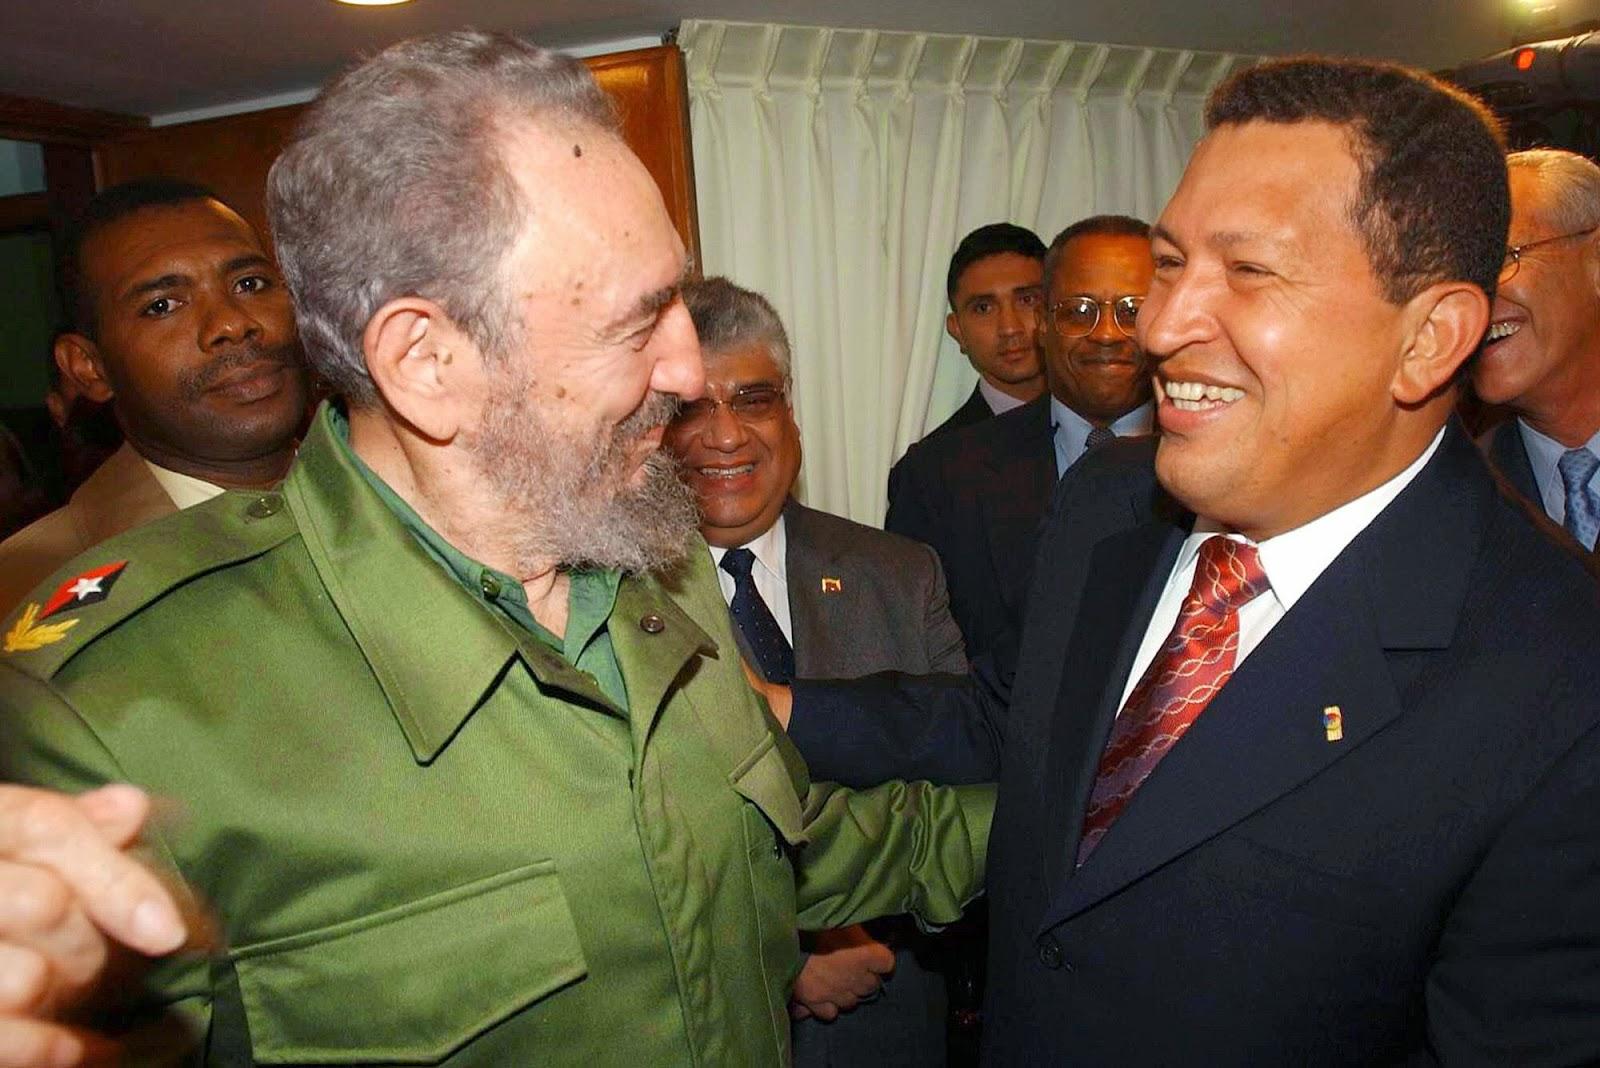 http://wikileaks-brasil.blogspot.com